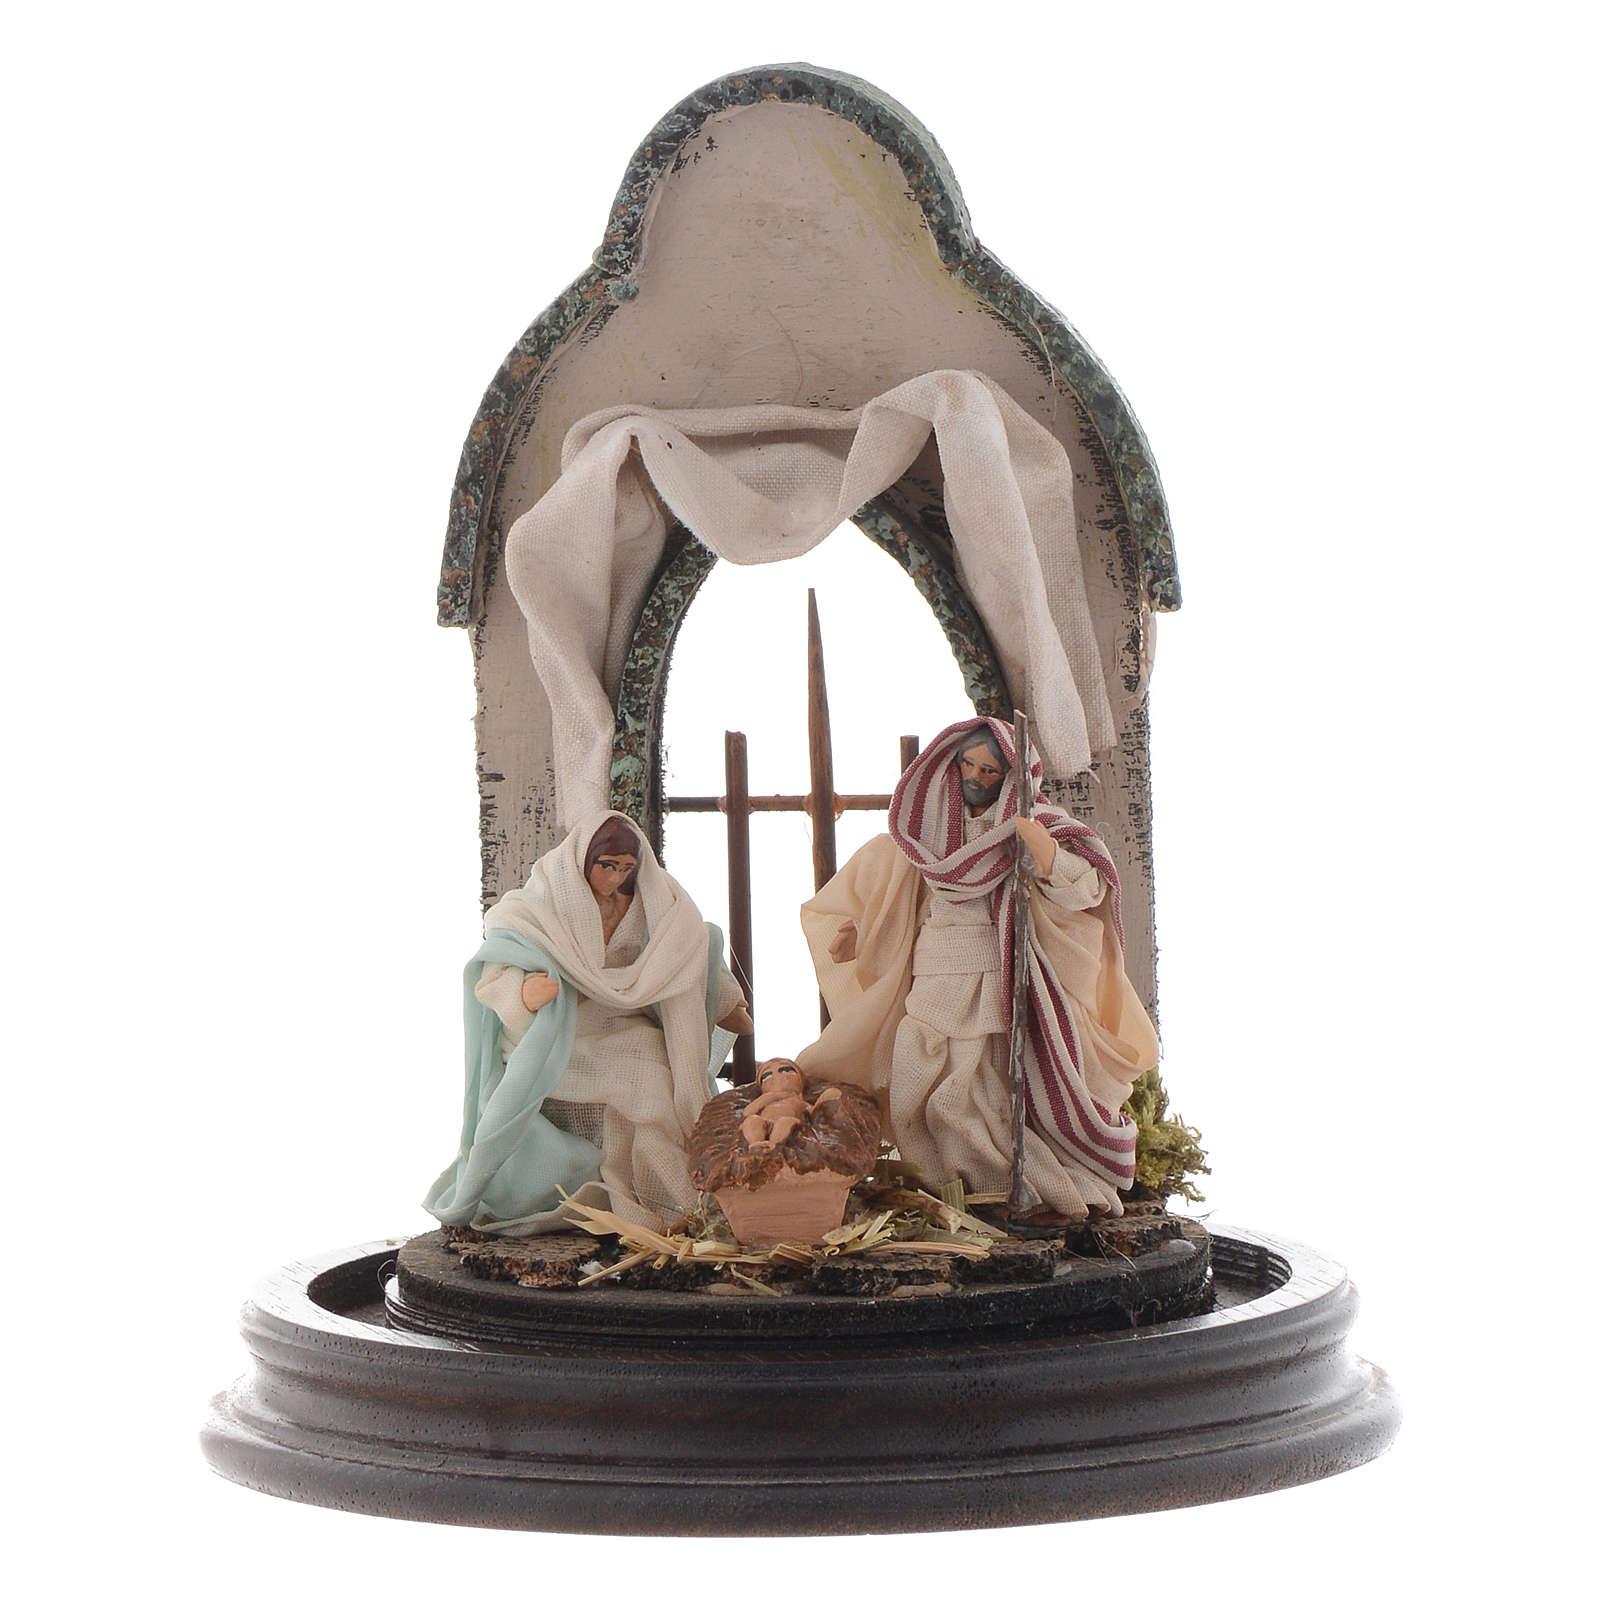 Scena natività stile arabo campana di vetro 20x15 cm presepe Napoli 4